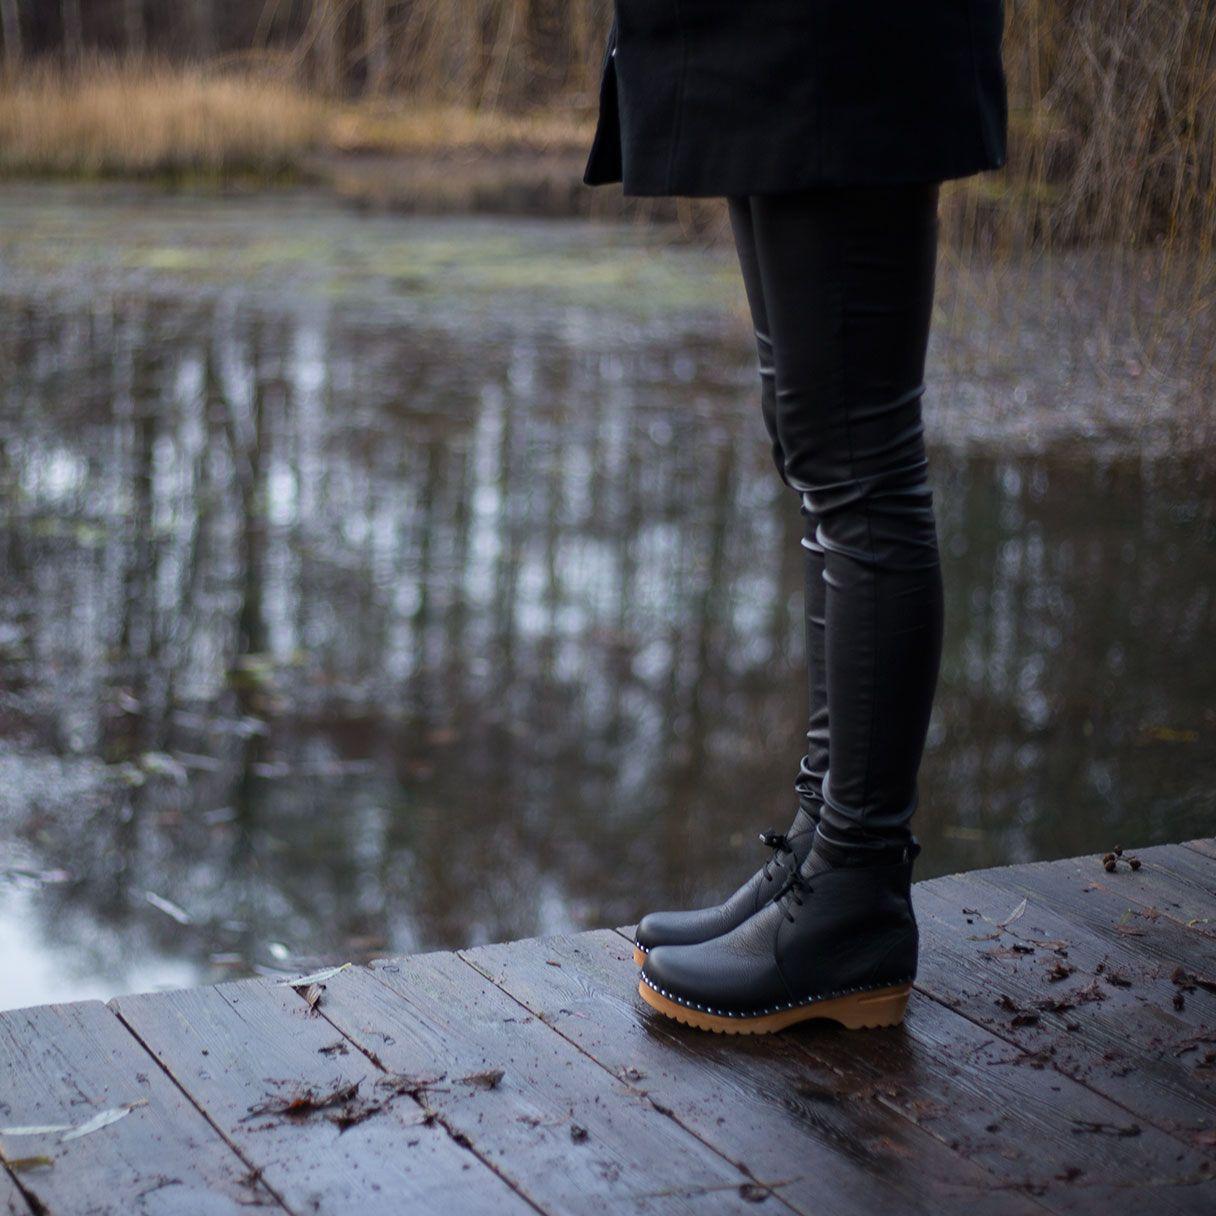 Morris Black in 2019 | Clog boots, Black boots, Boots